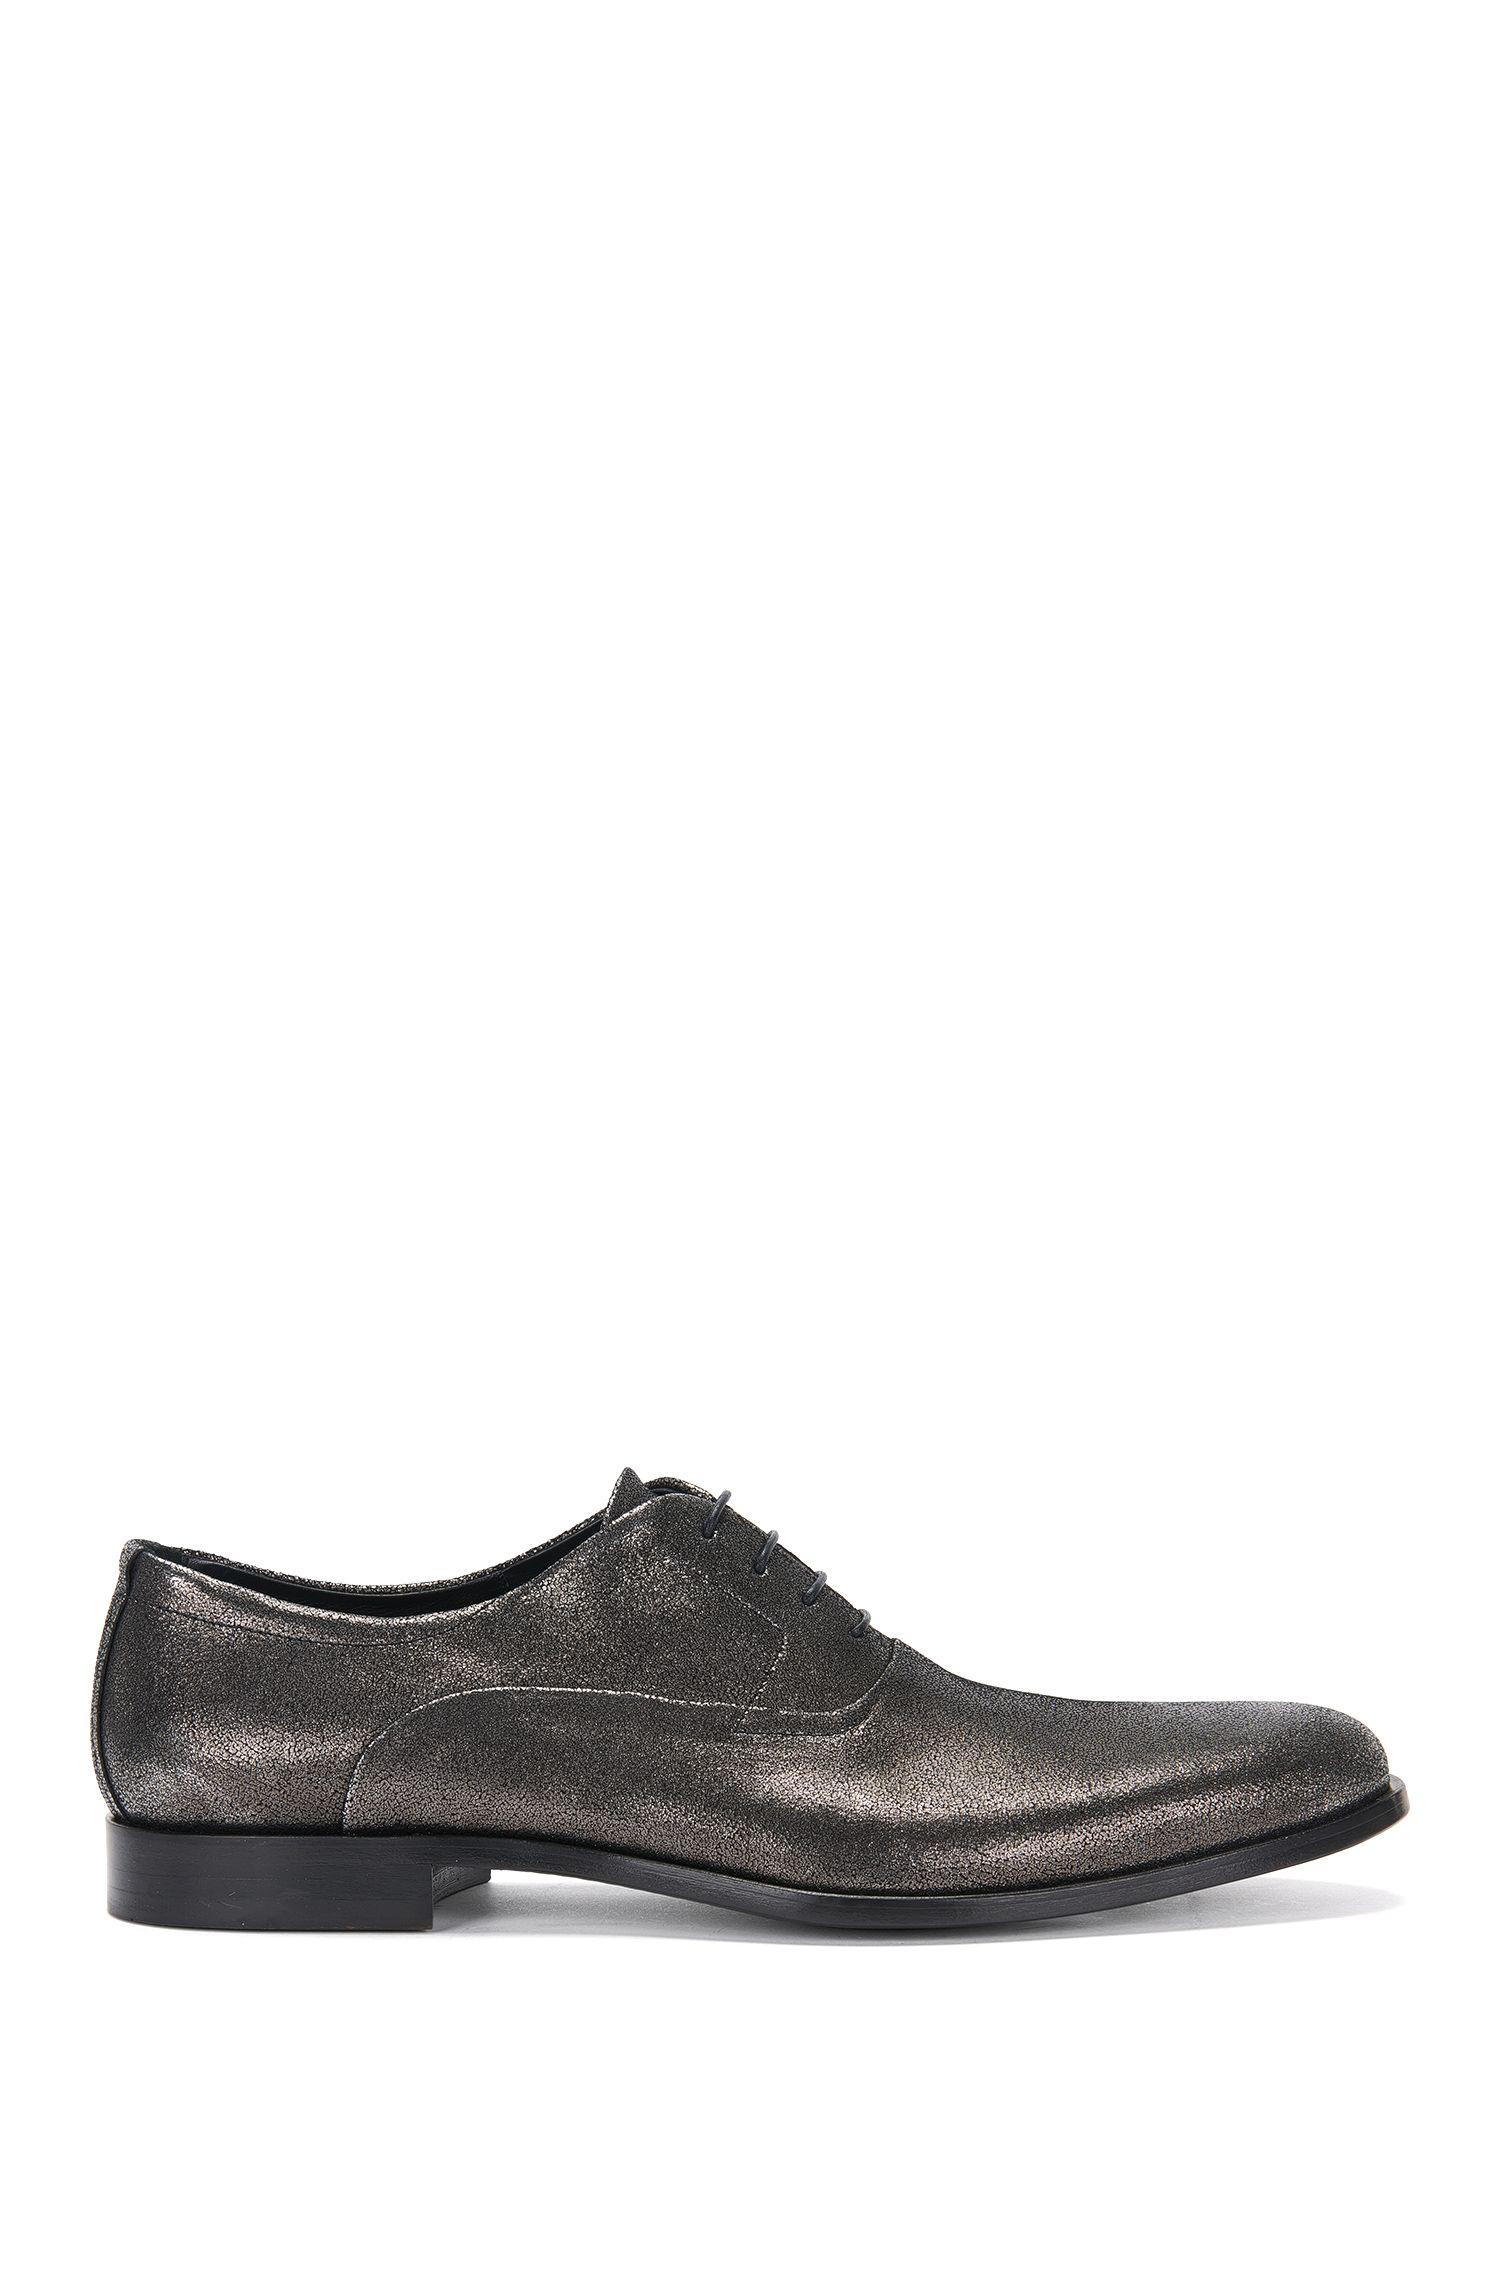 Italian Leather Suede Metallic Oxford Shoe | Sigma Oxfr Sdg